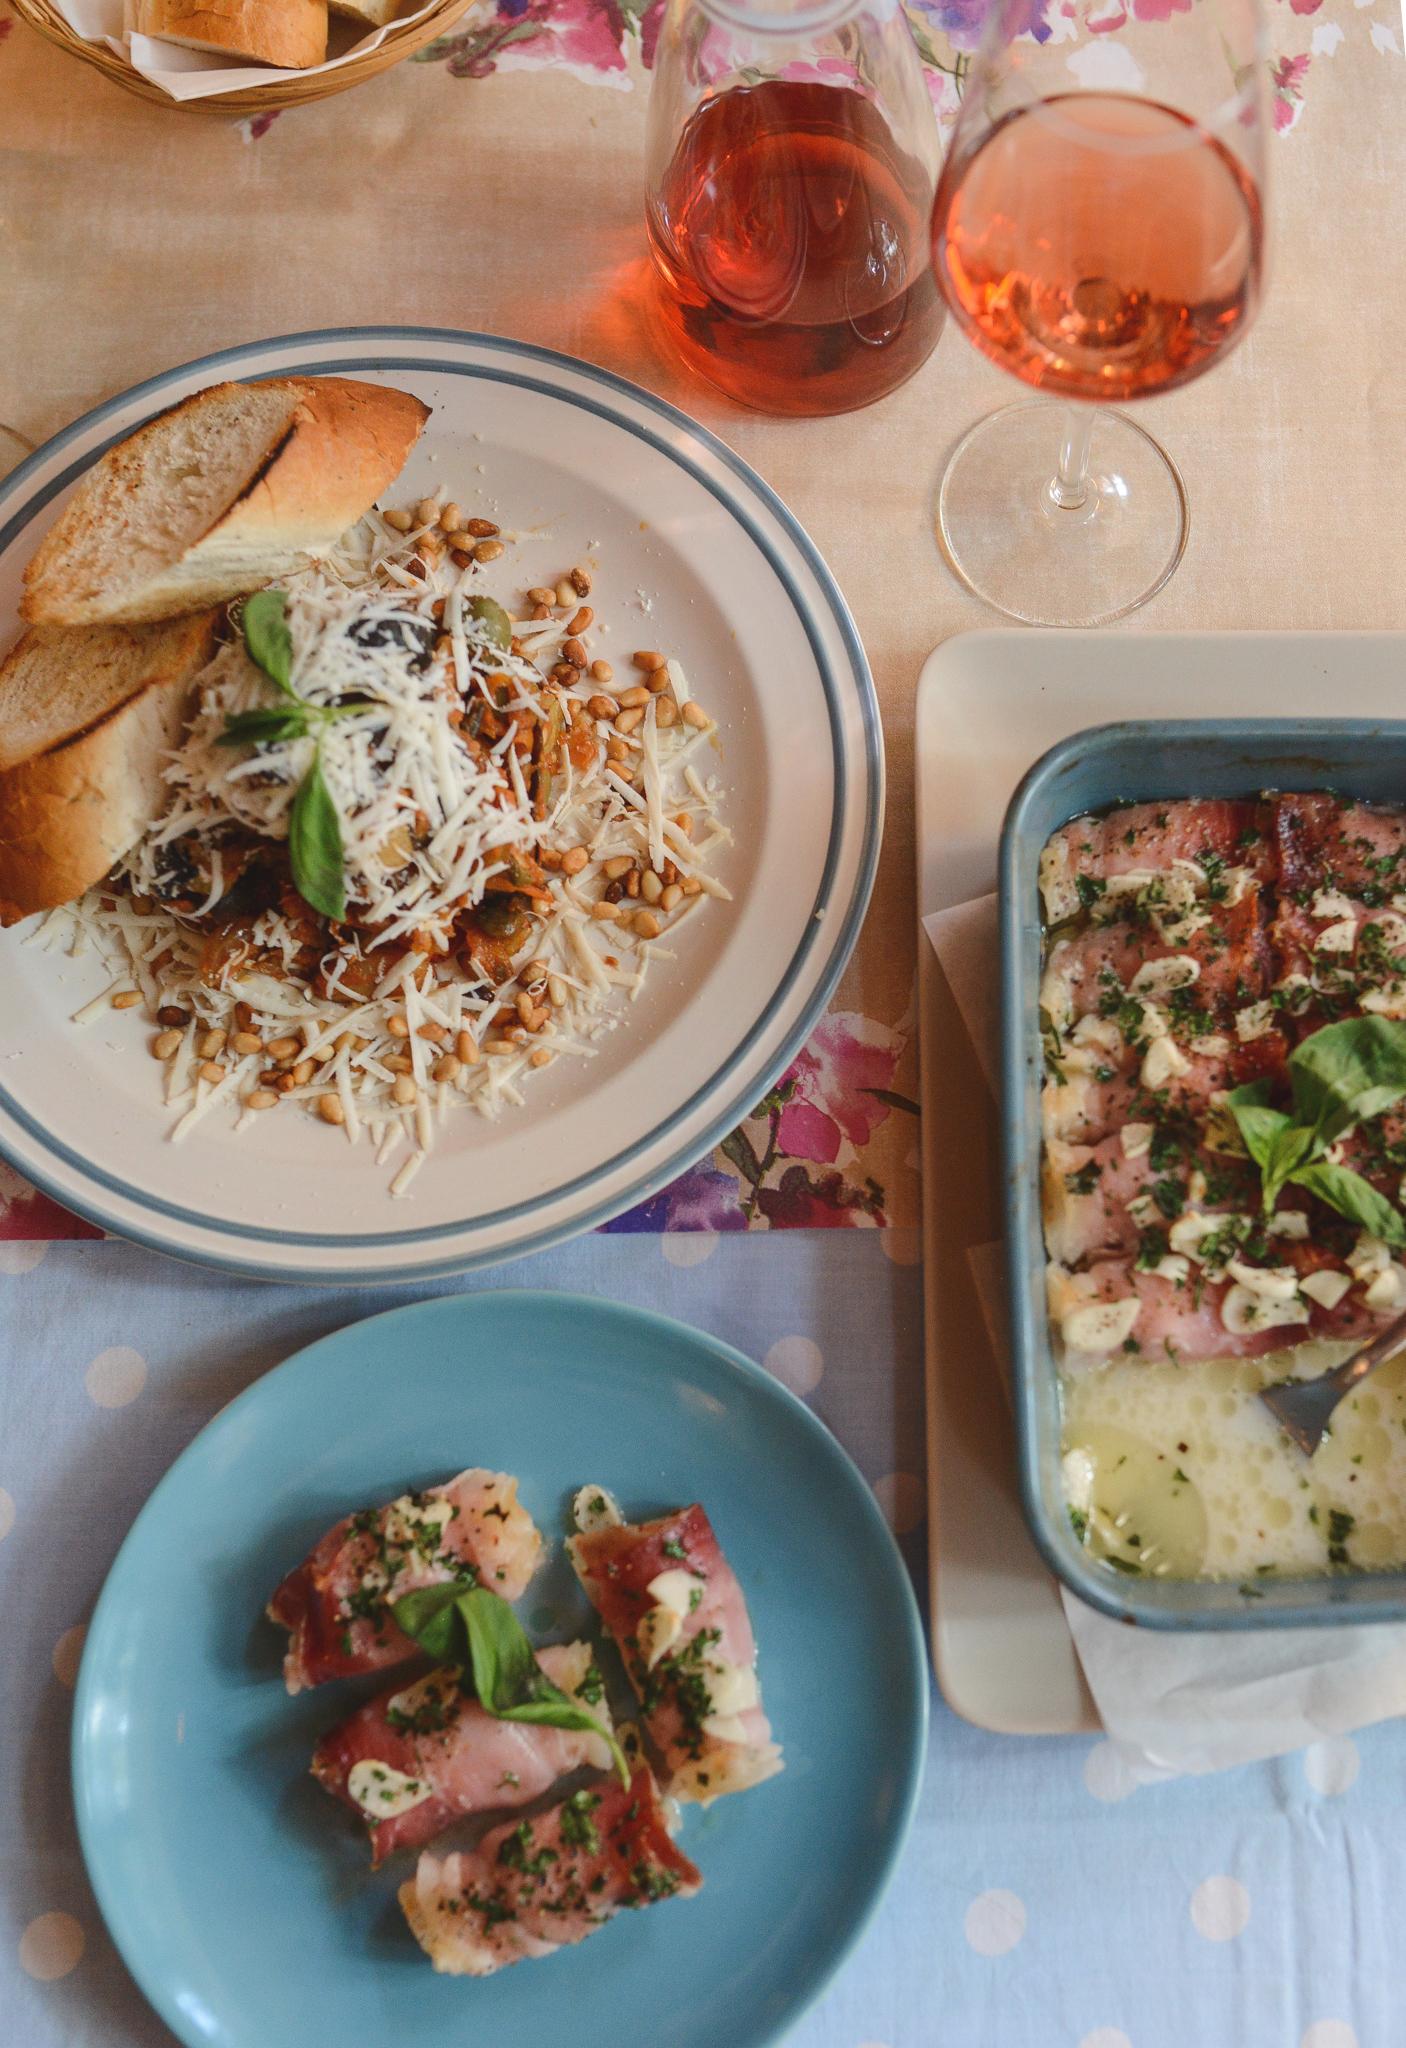 CAPONATA SICILIANA i PARMA, restauracja La Nonna Siciliana - sycylijska kuchnia w Toruniu